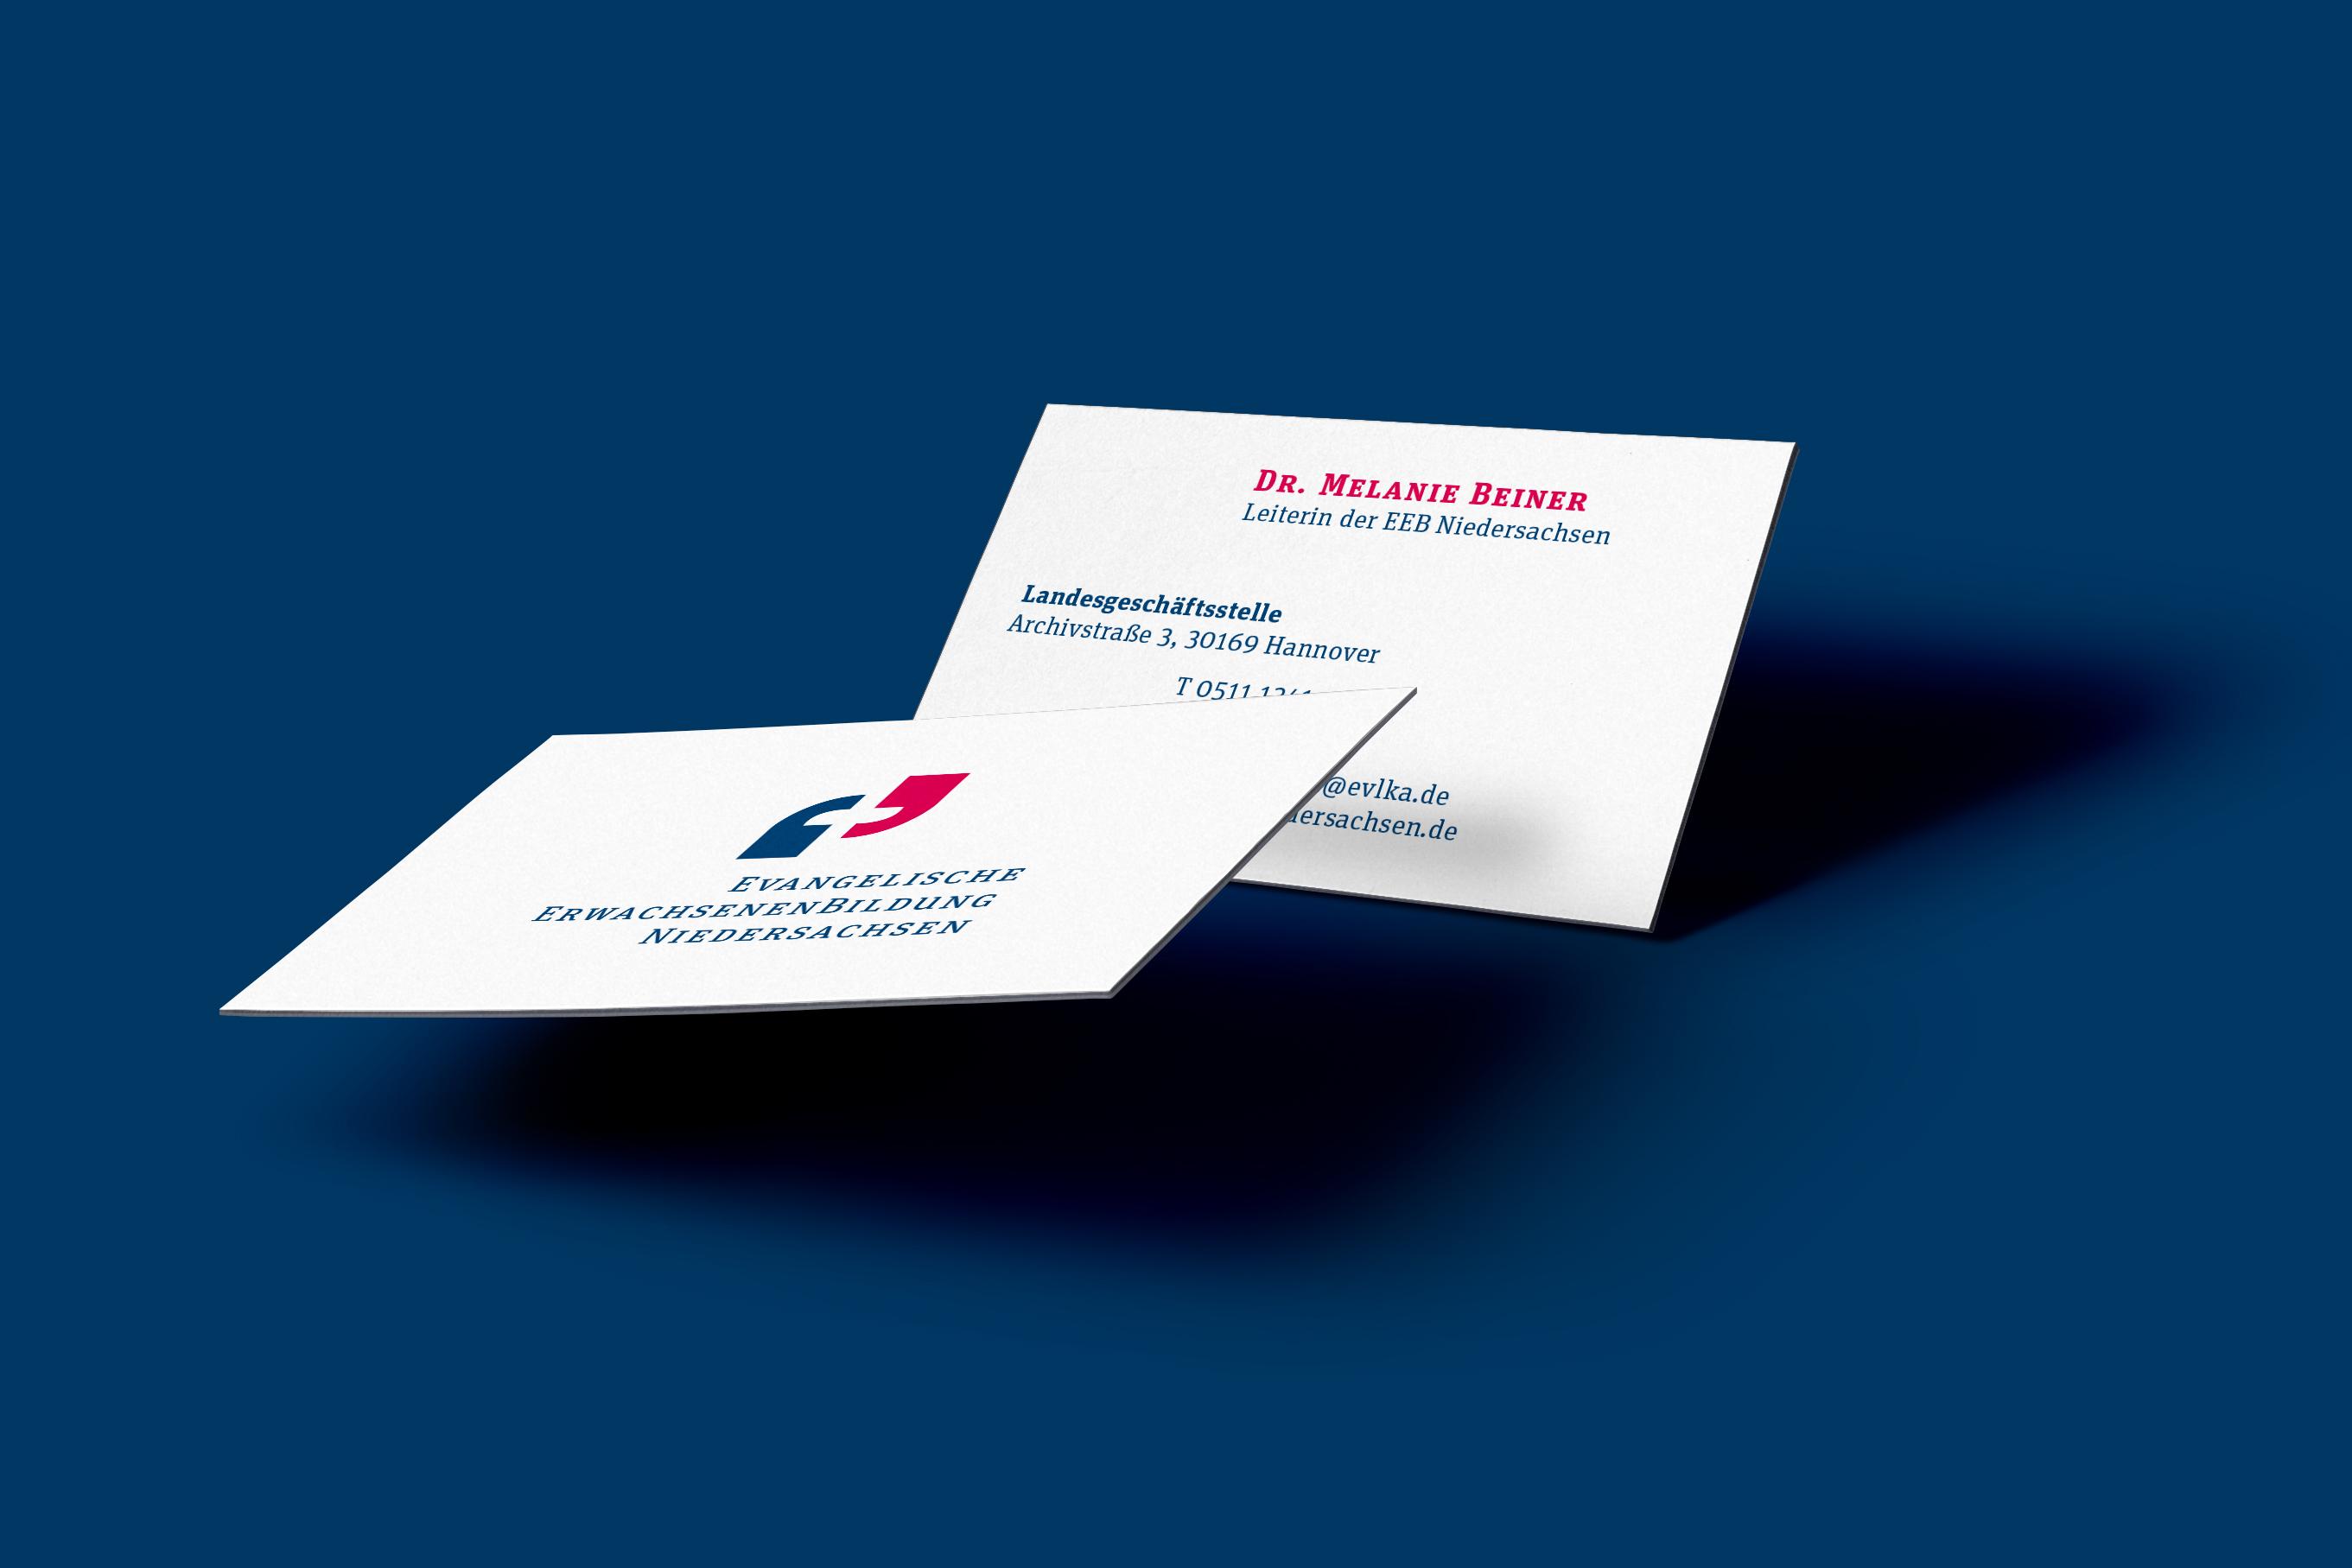 EEB_Business-Card_1170x780px